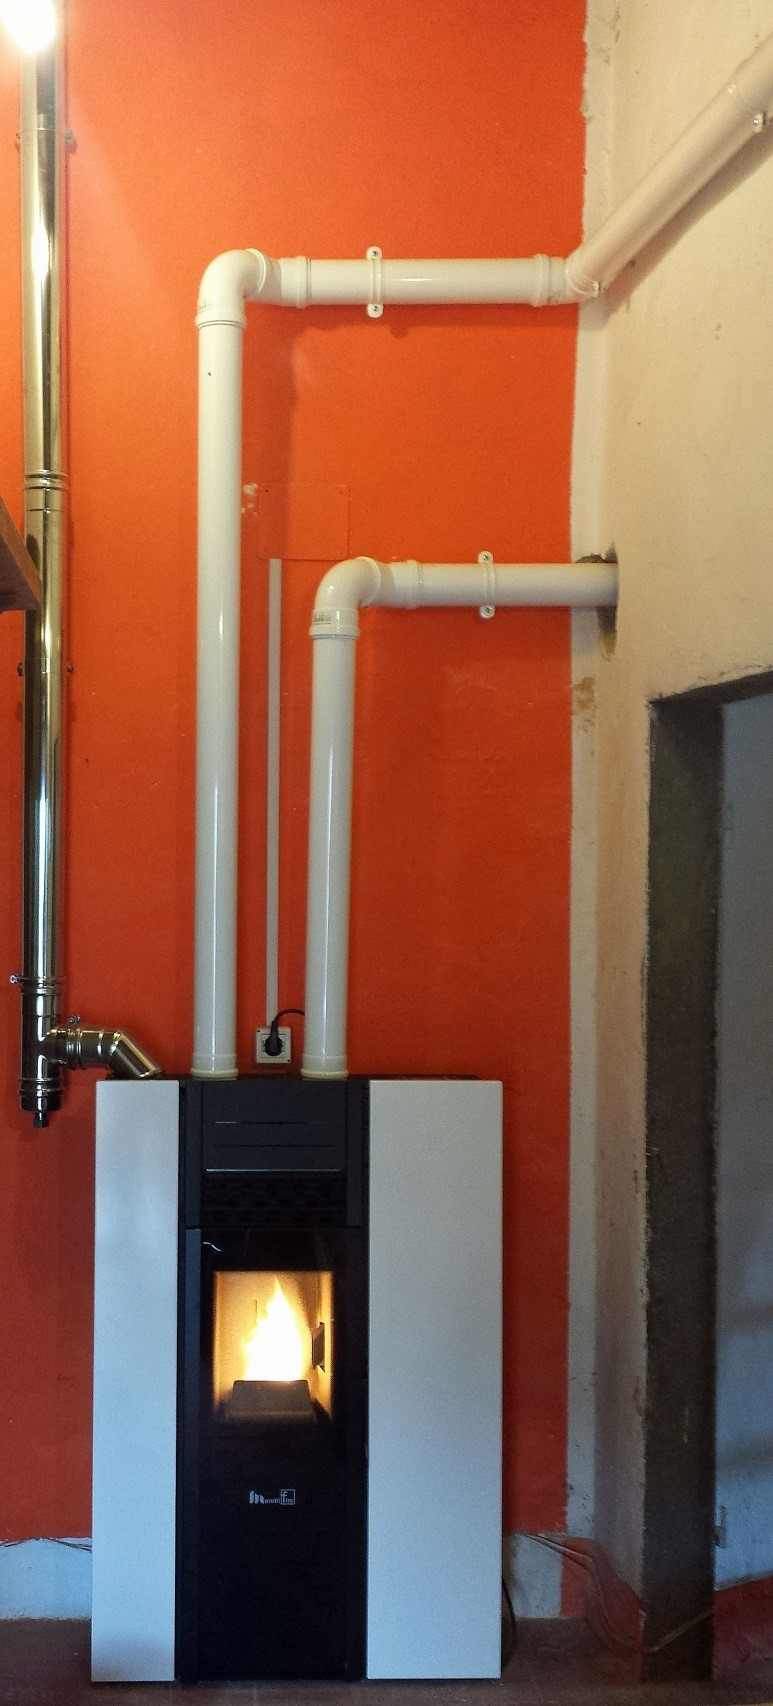 Stufa a pellet slim canalizzata ecohabitat impianti - Impianti stufe a pellet ...